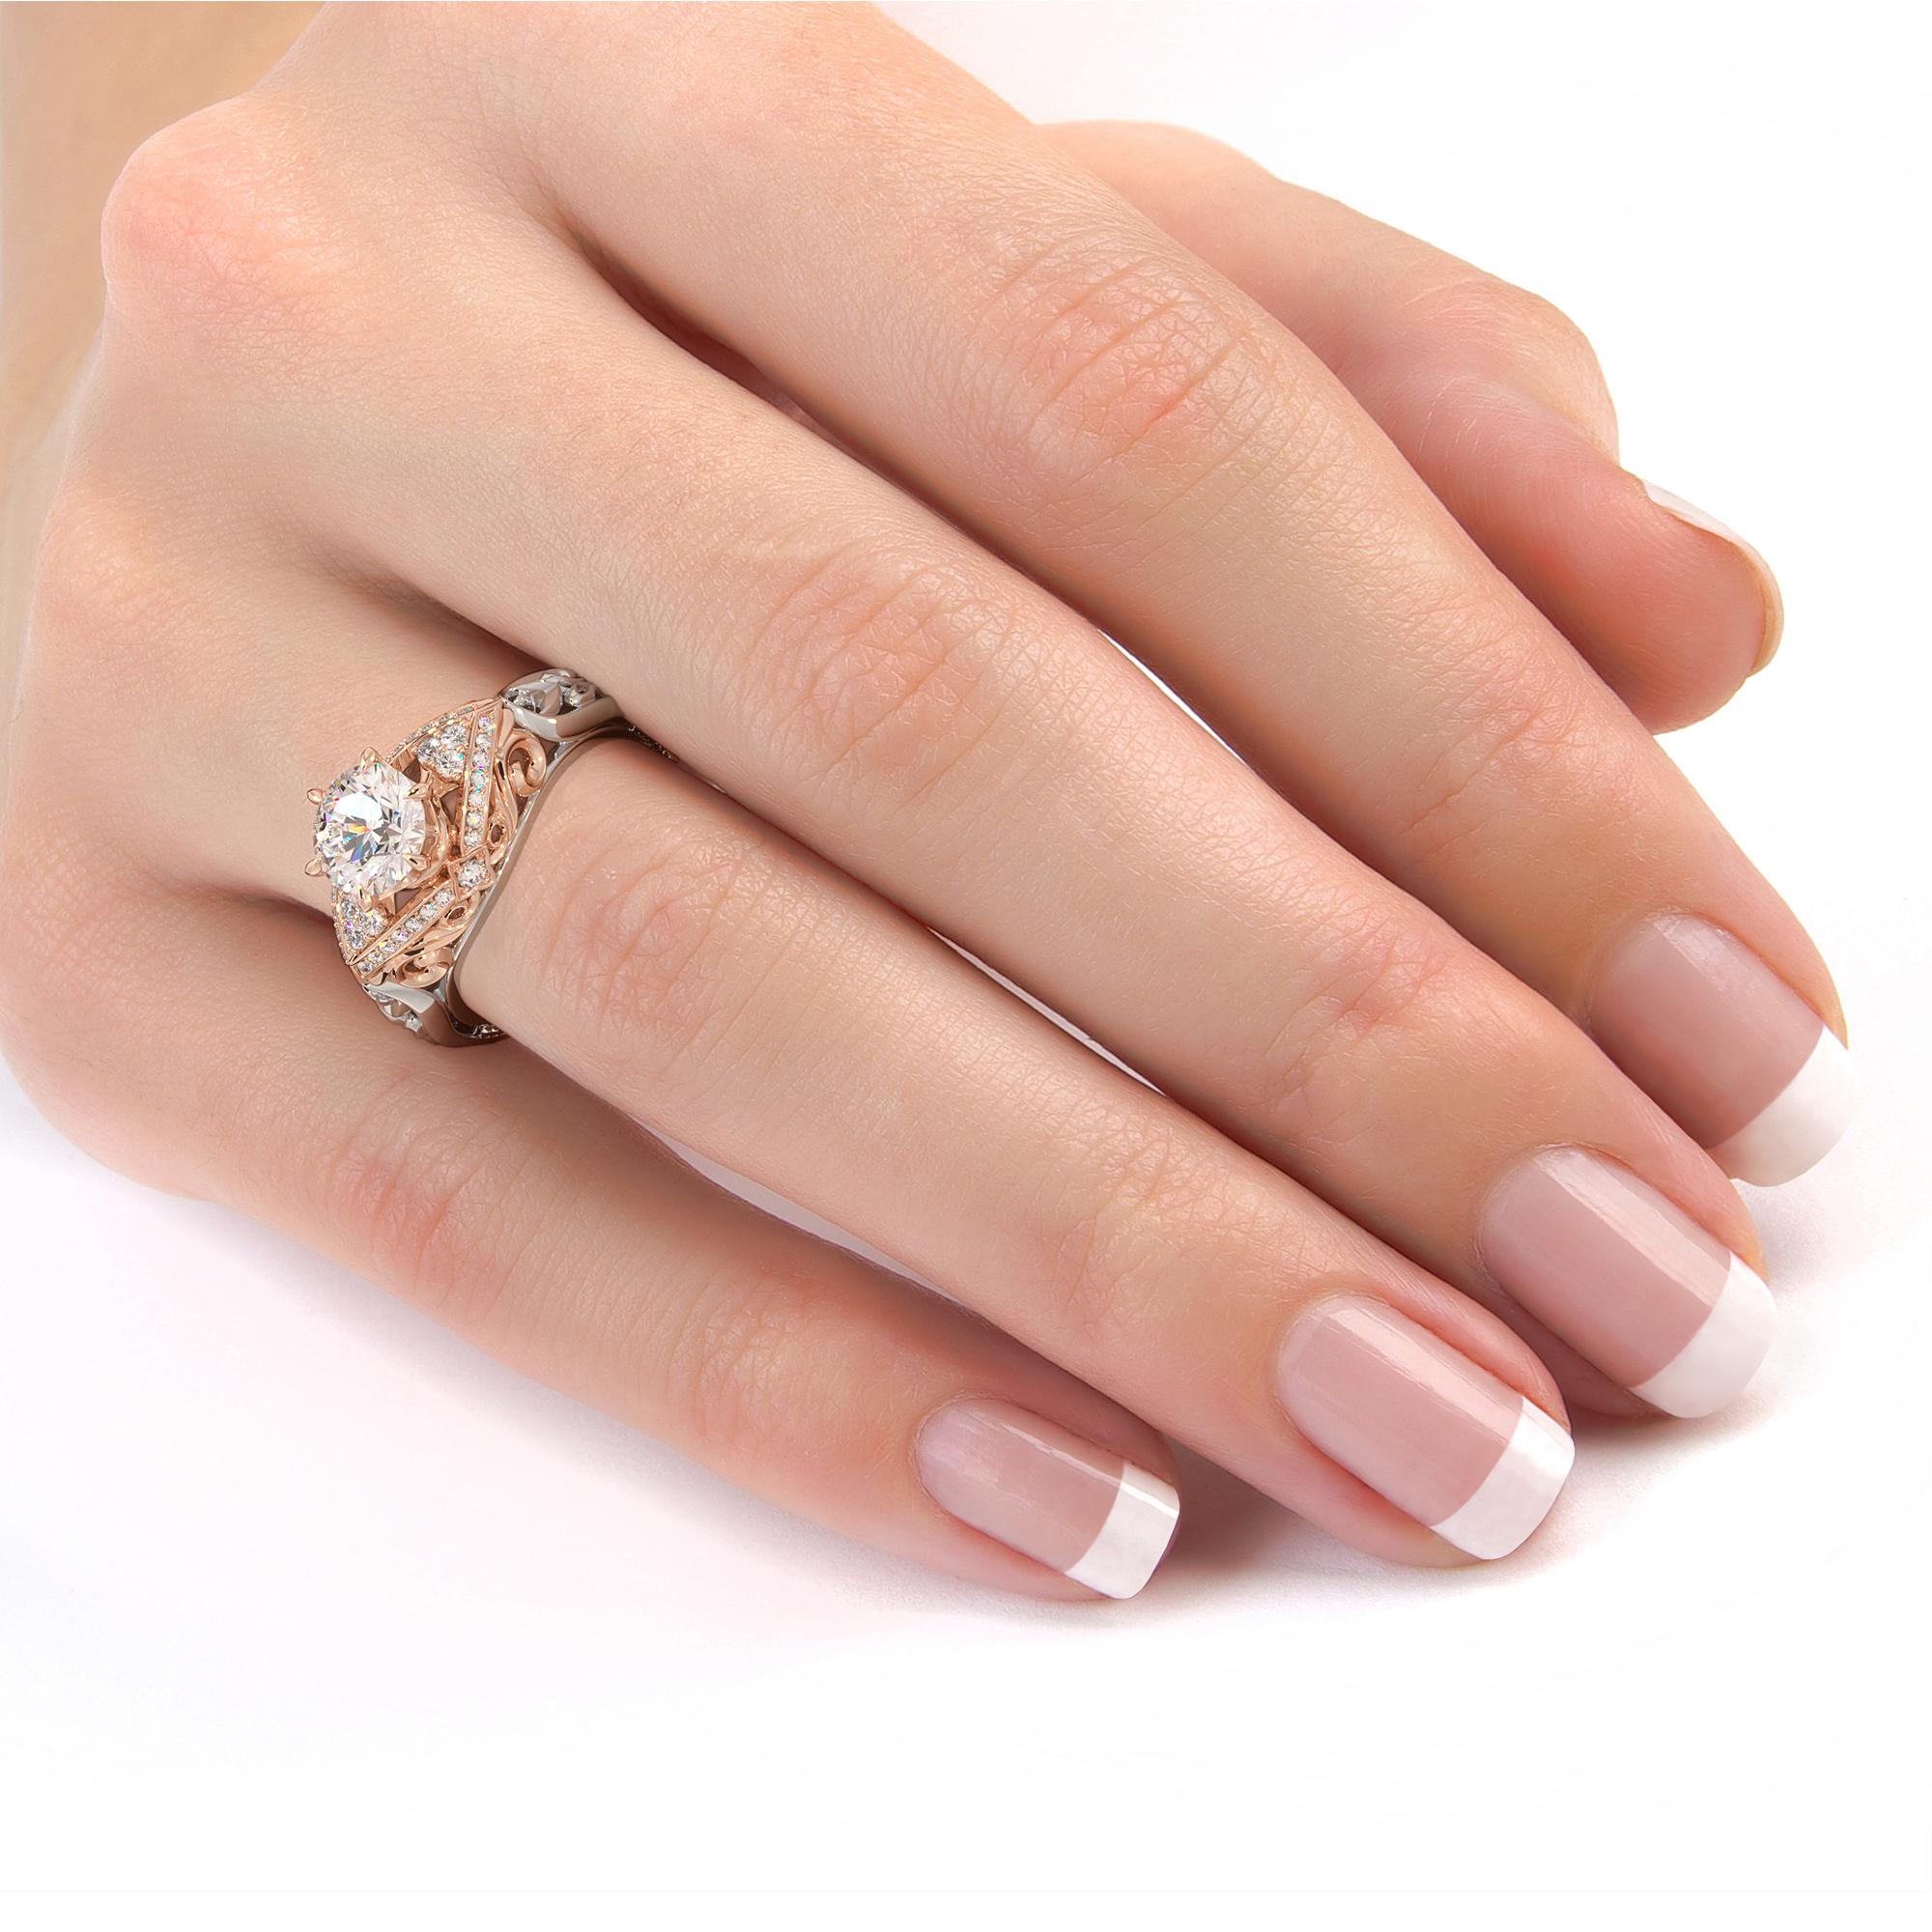 Amazing 1.55 Carat Moissanite Engagement Ring Two Tone Gold Engagement Ring